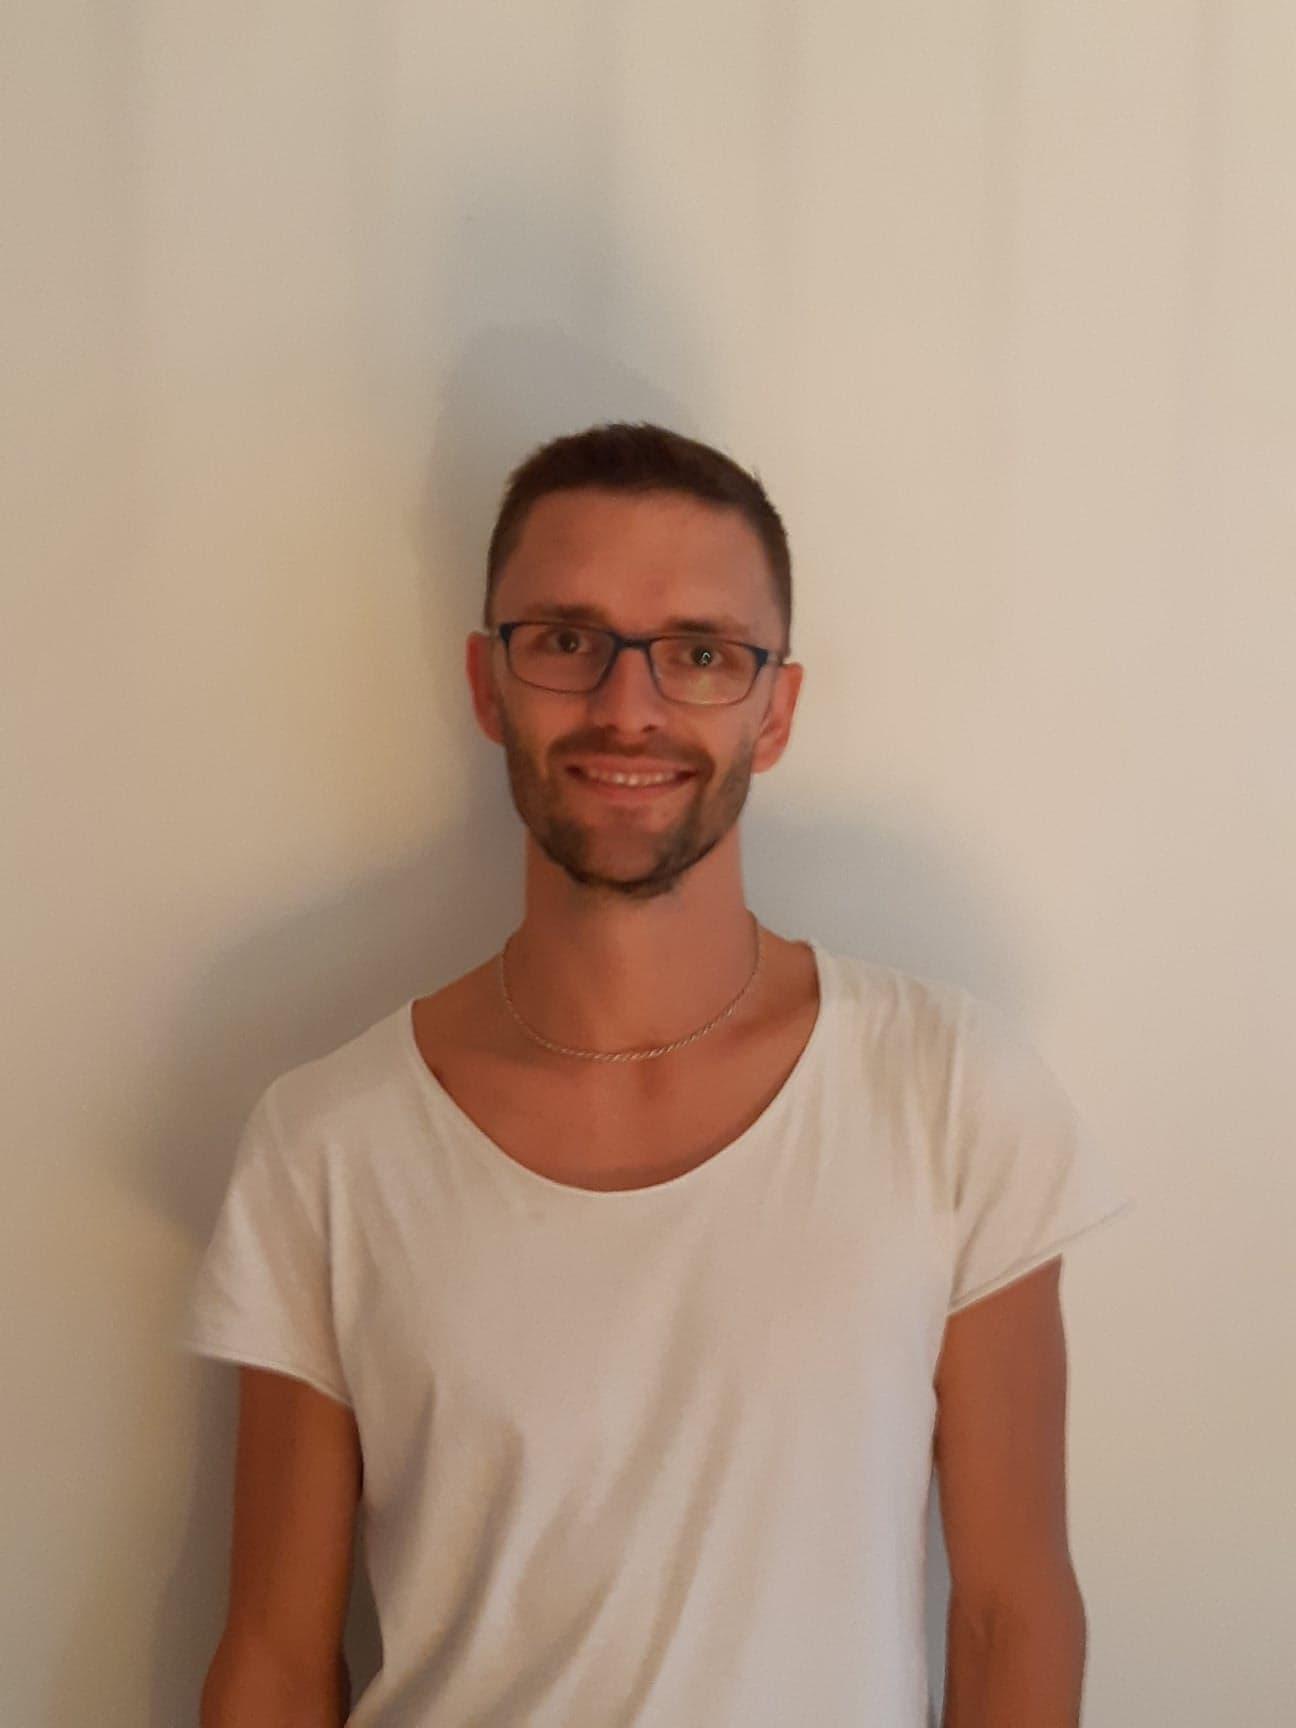 Jakob Edinger